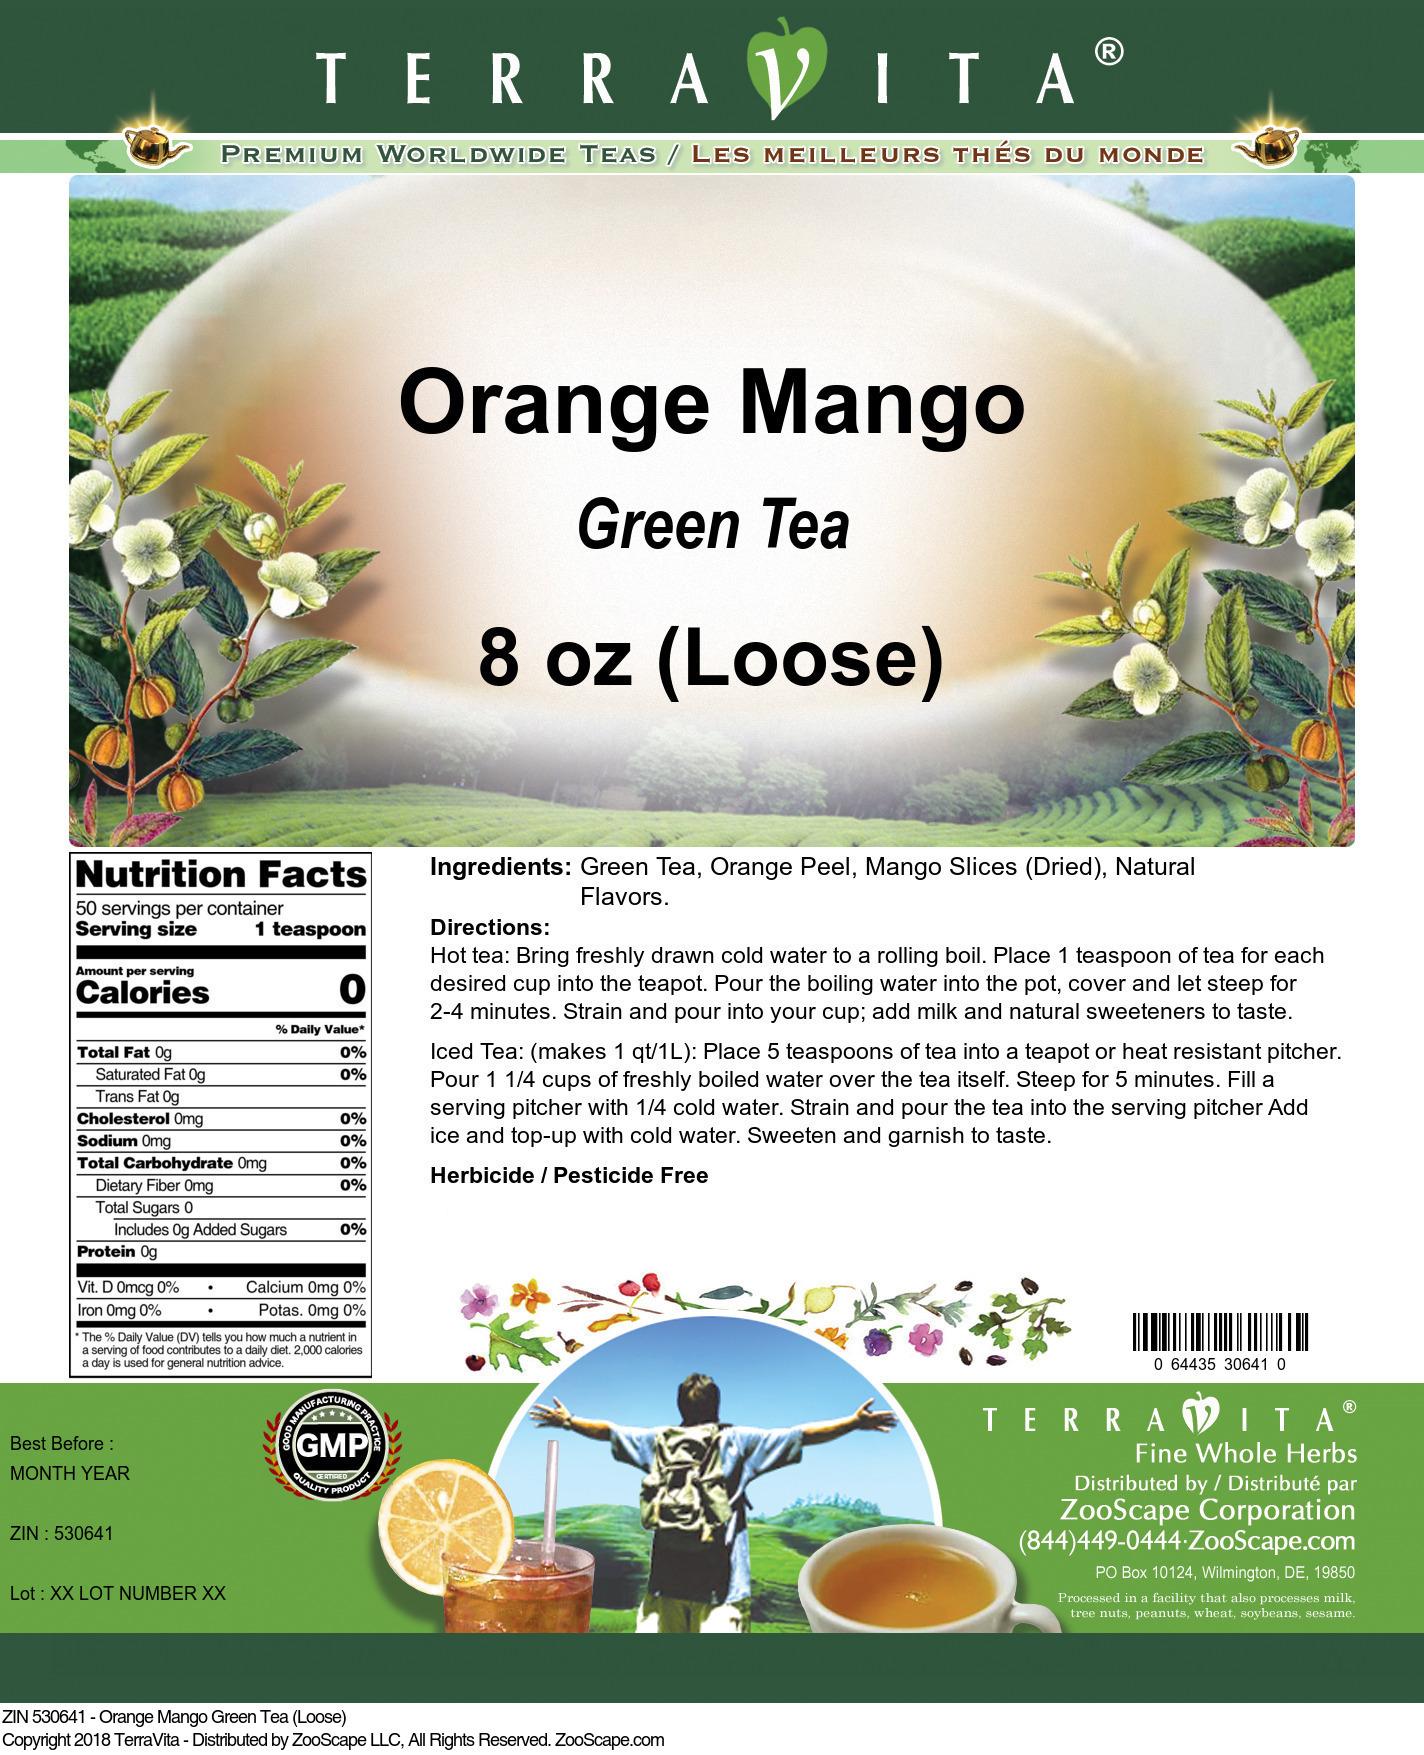 Orange Mango Green Tea (Loose)